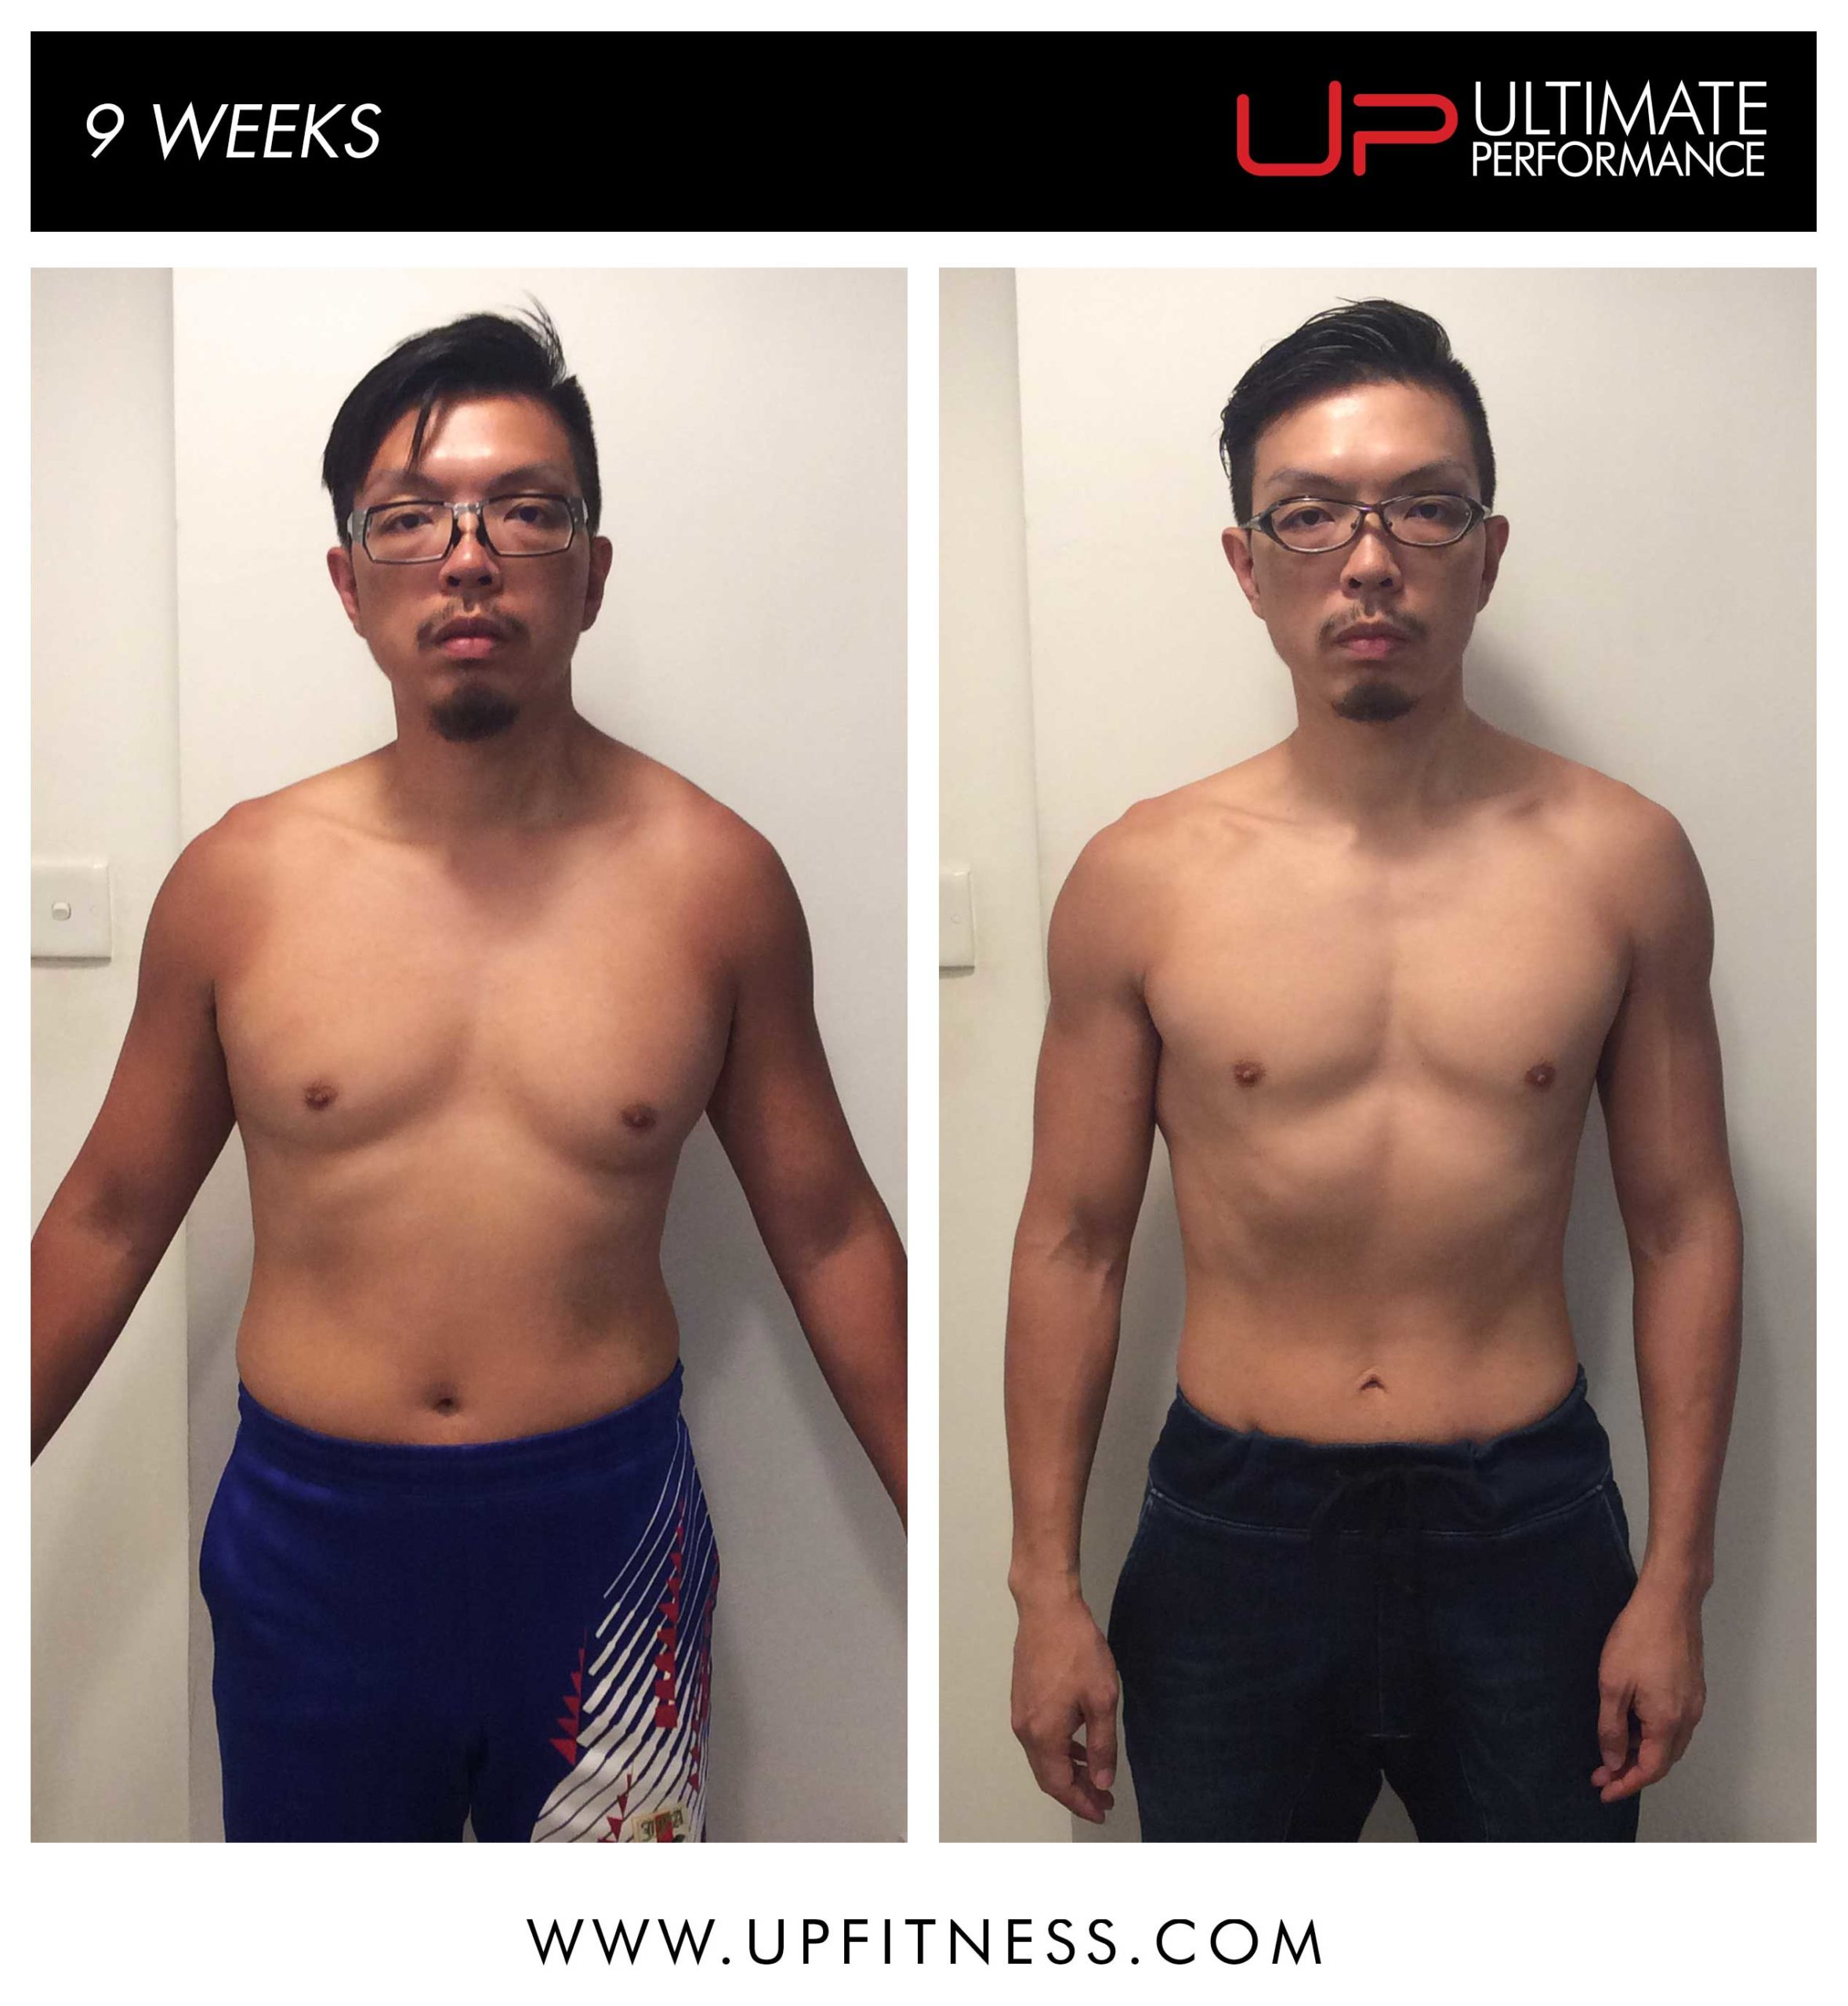 Frank's 9 week transformation